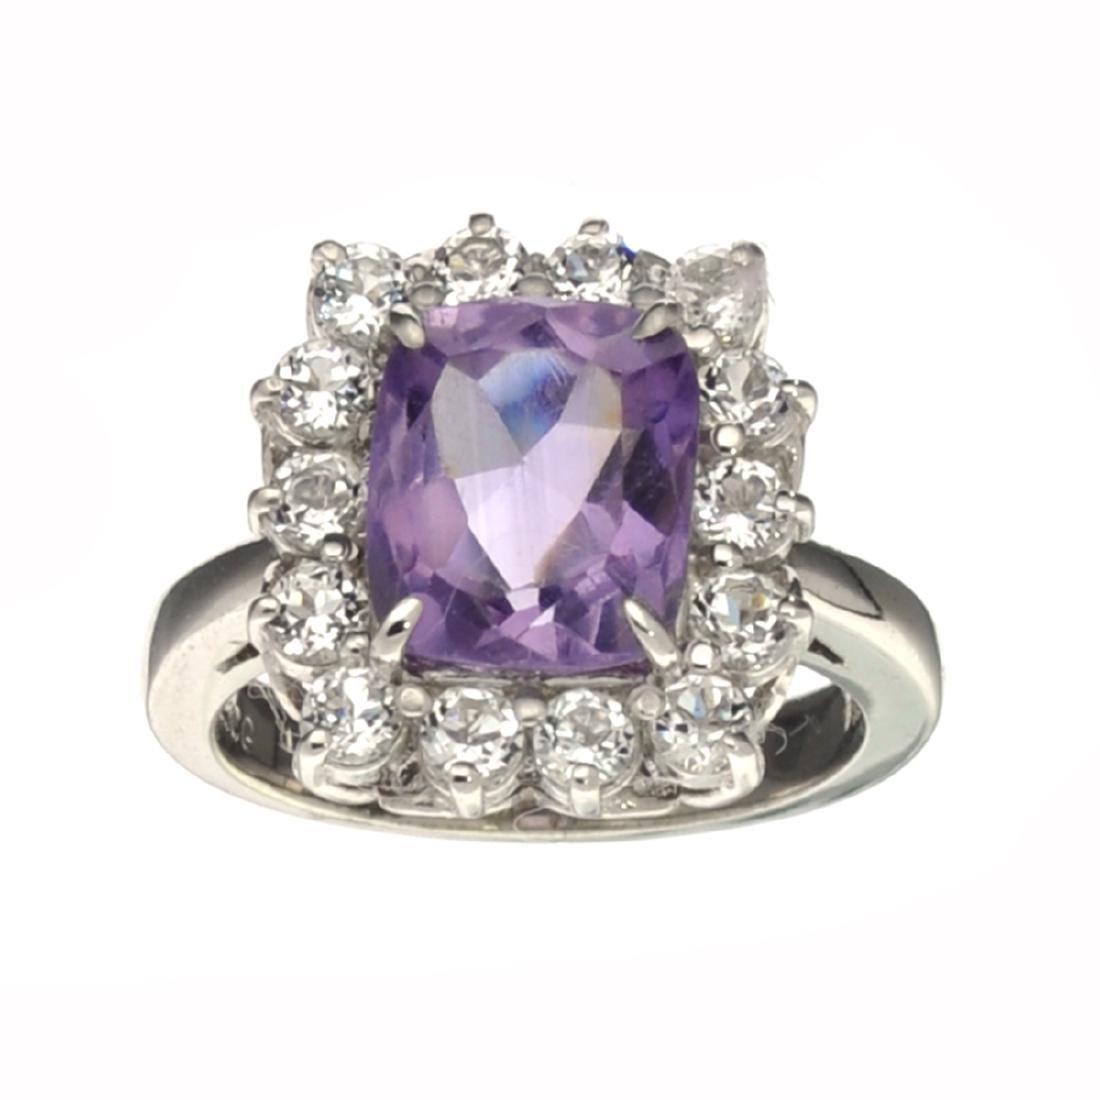 APP: 0.6k Fine Jewelry Designer Sebastian, 3.69CT